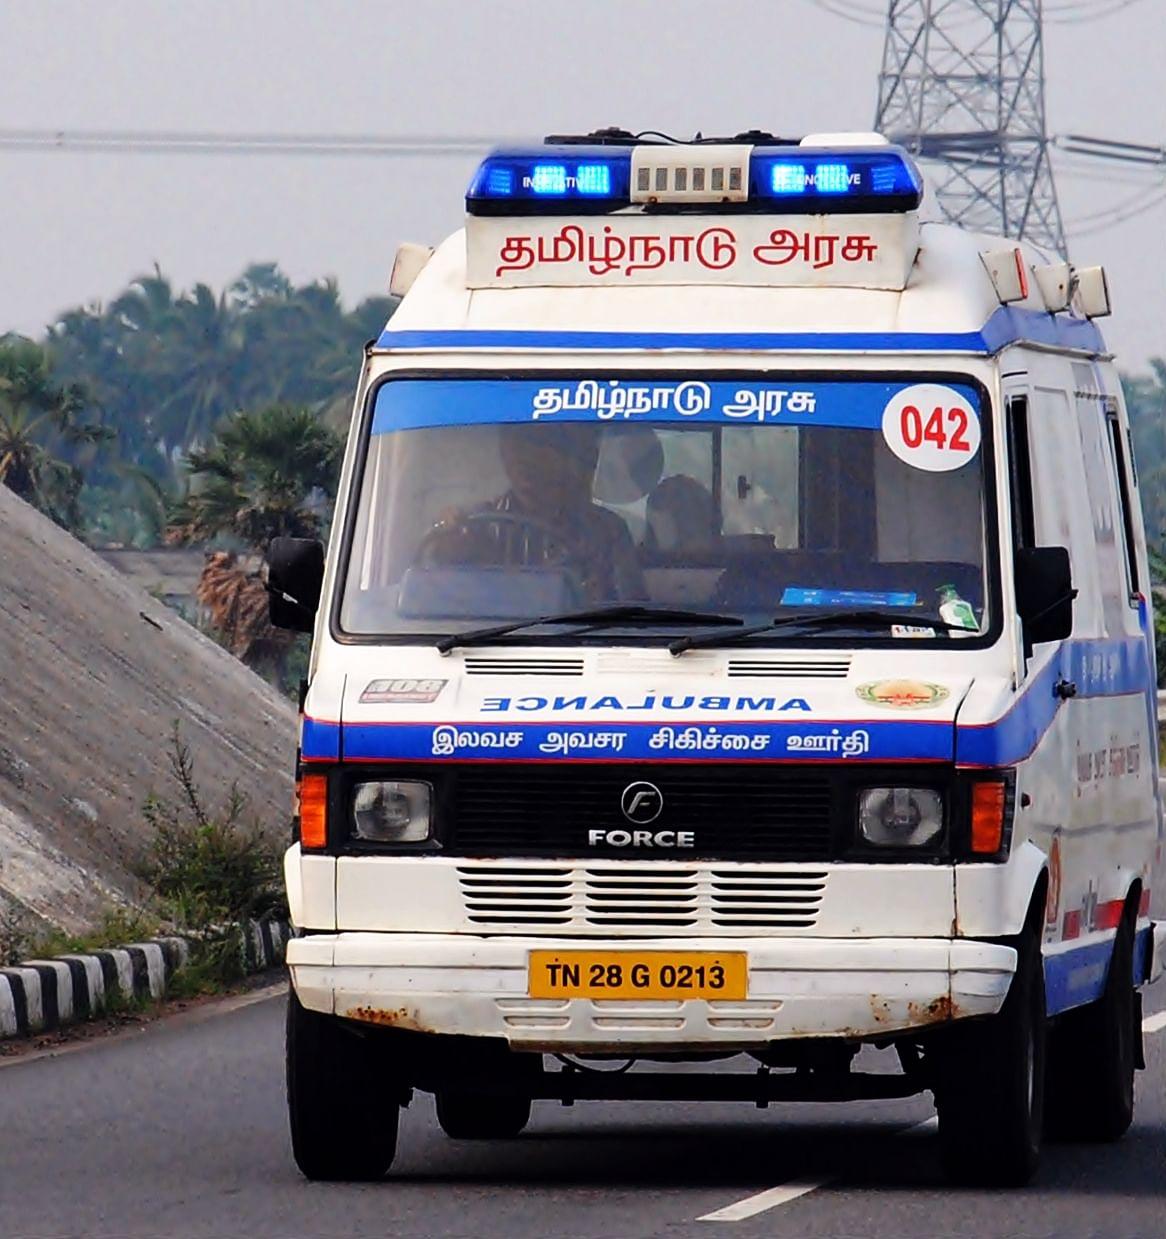 The 108 Ambulance System (Source: Wikimedia Commons)